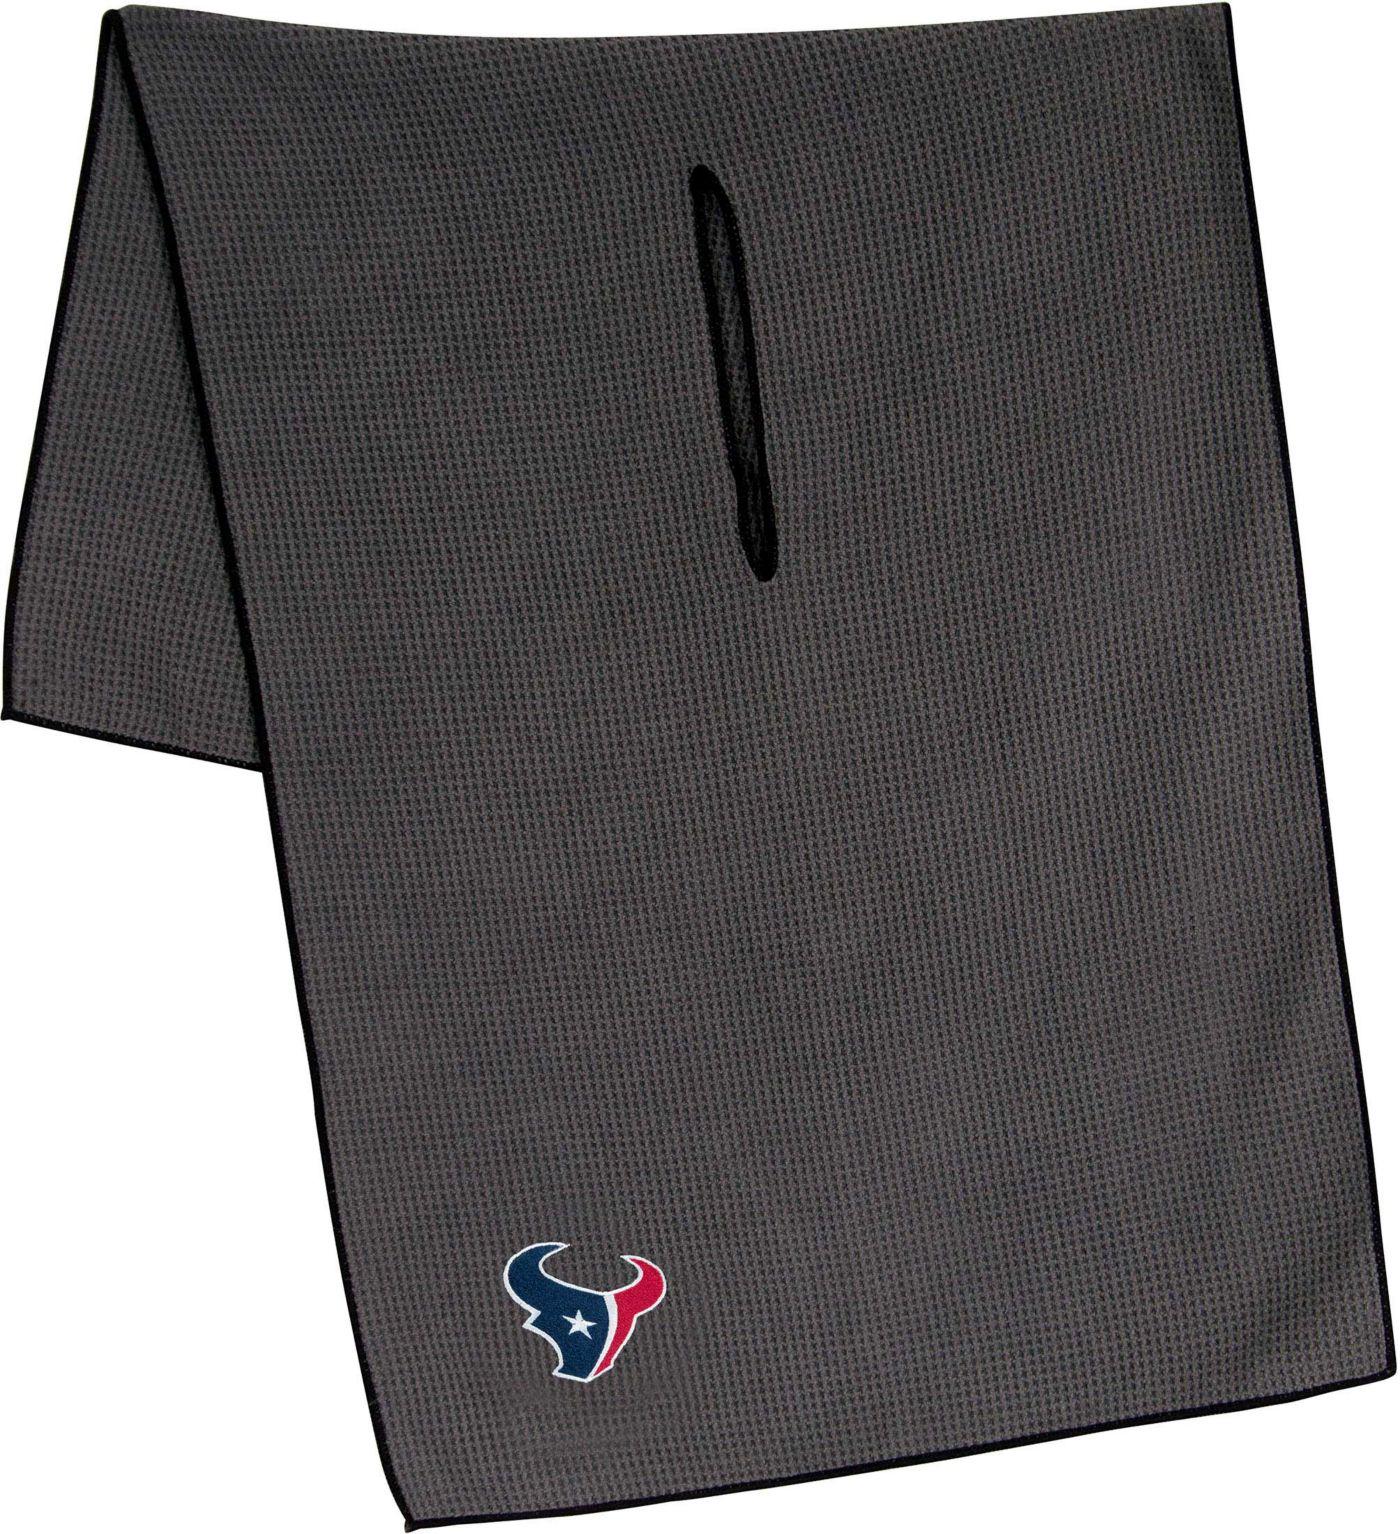 "Team Effort Houston Texans 19"" x 41"" Microfiber Golf Towel"